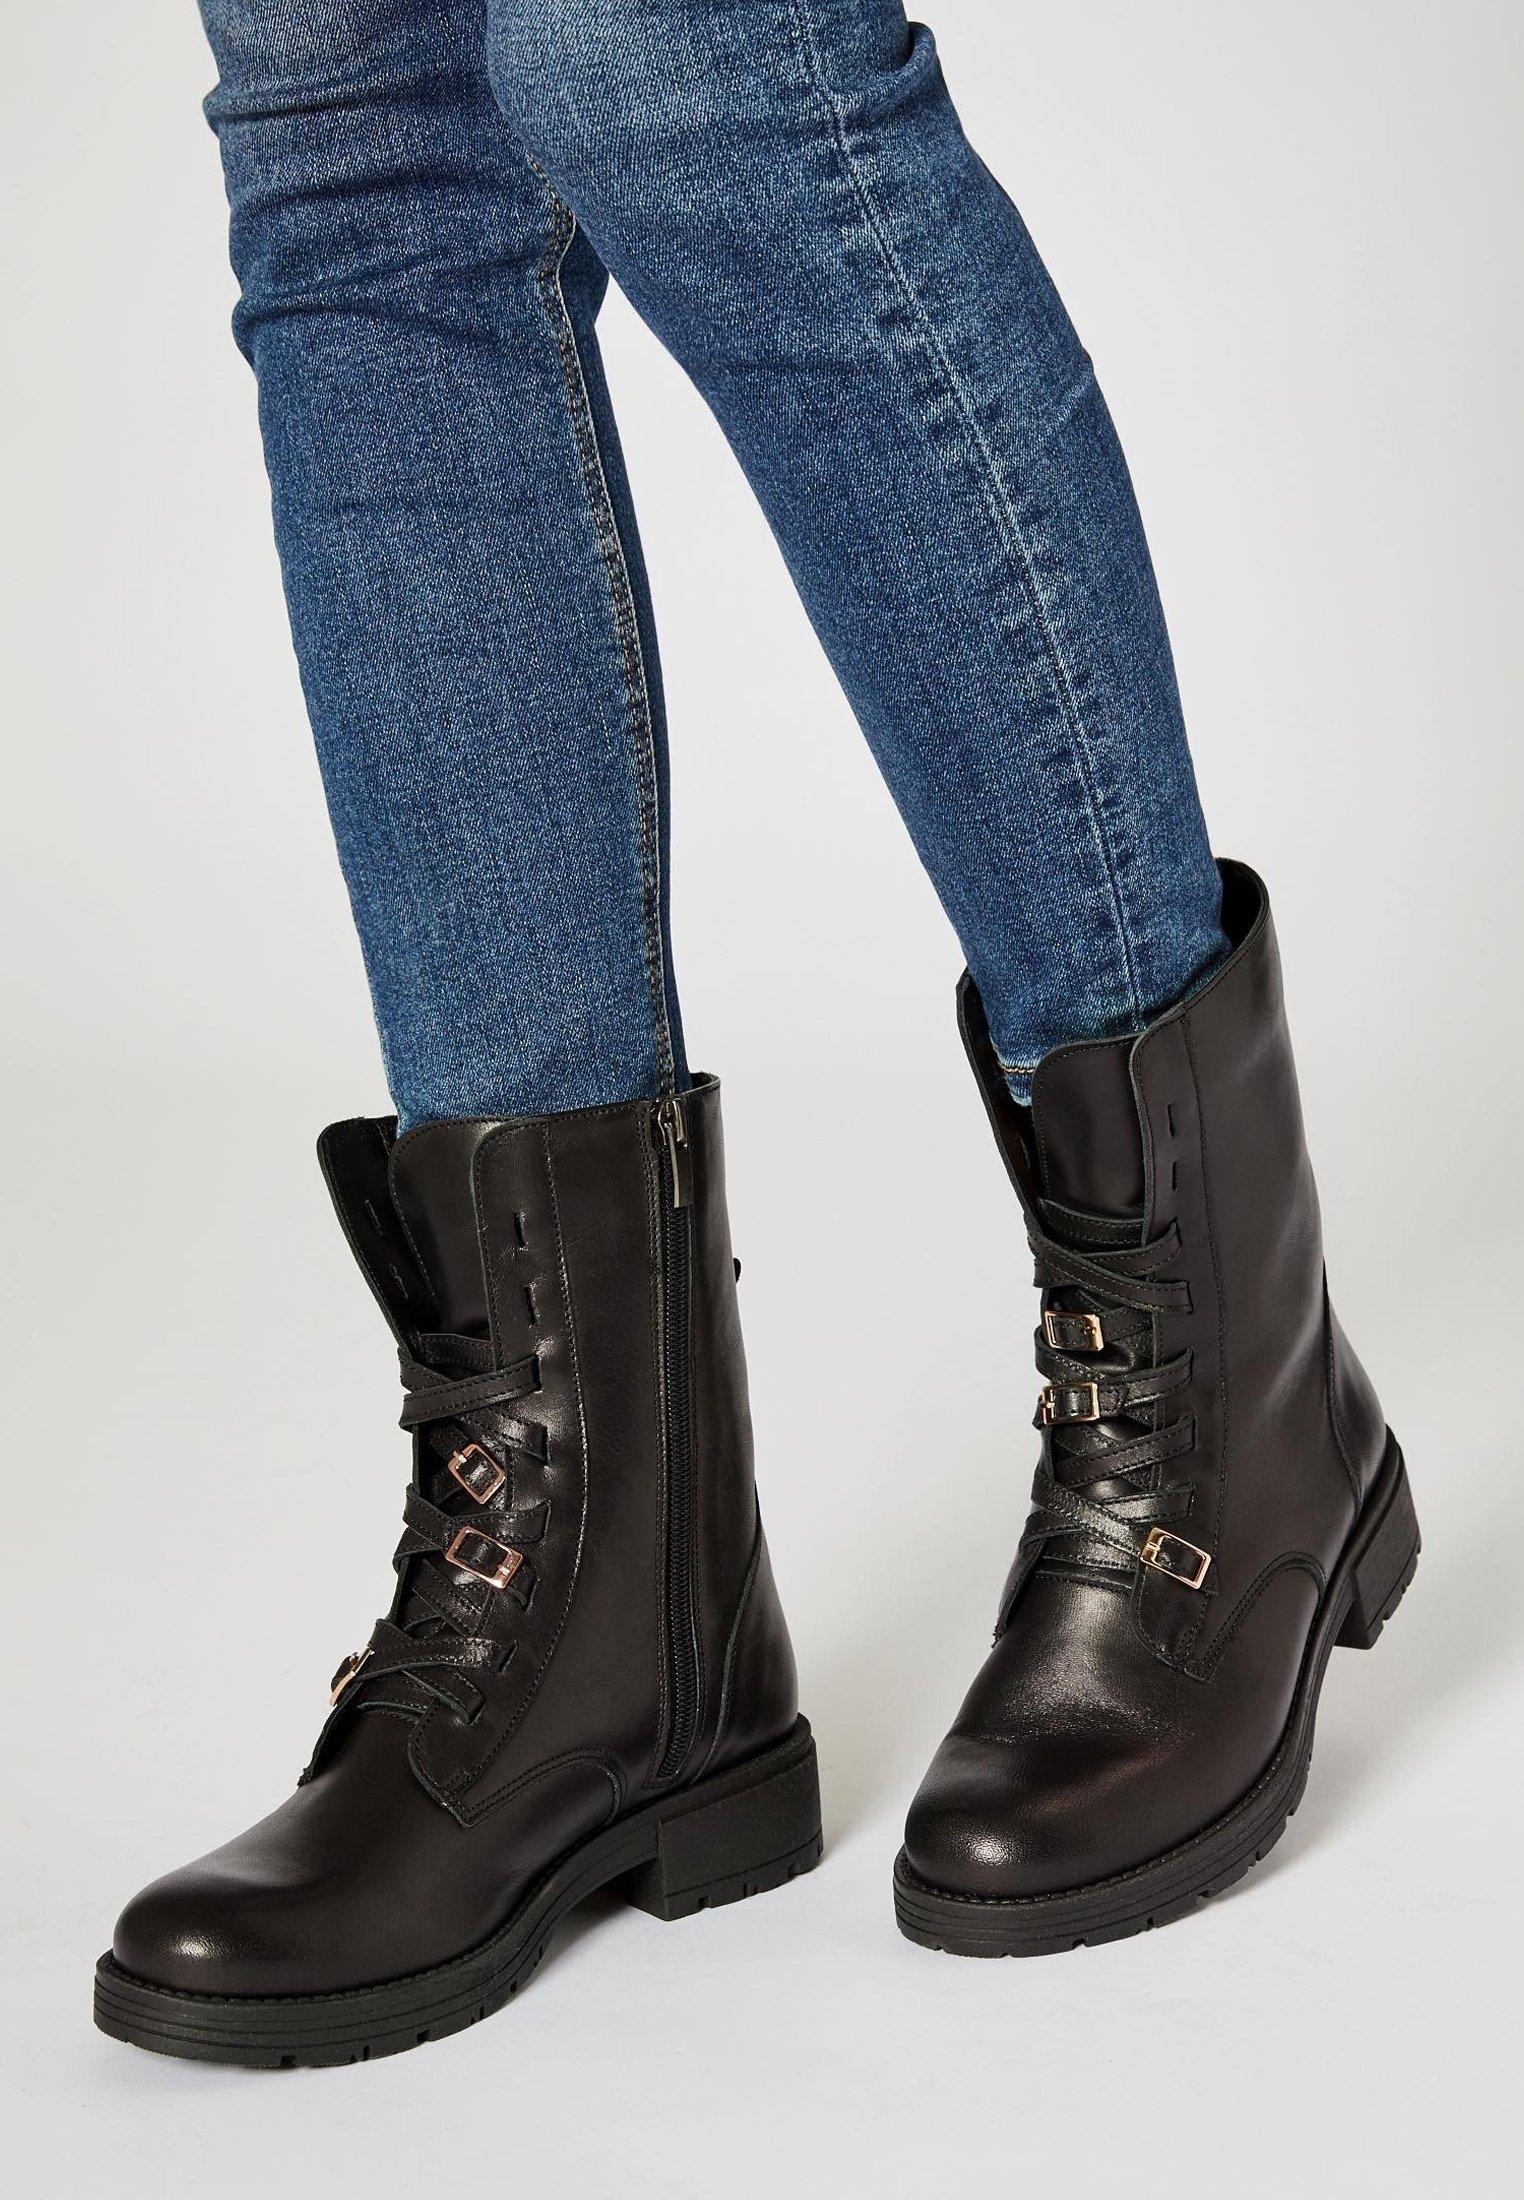 Particular Discount Cheapest myMo ROCKS Classic ankle boots - black | women's shoes 2020 ttqux